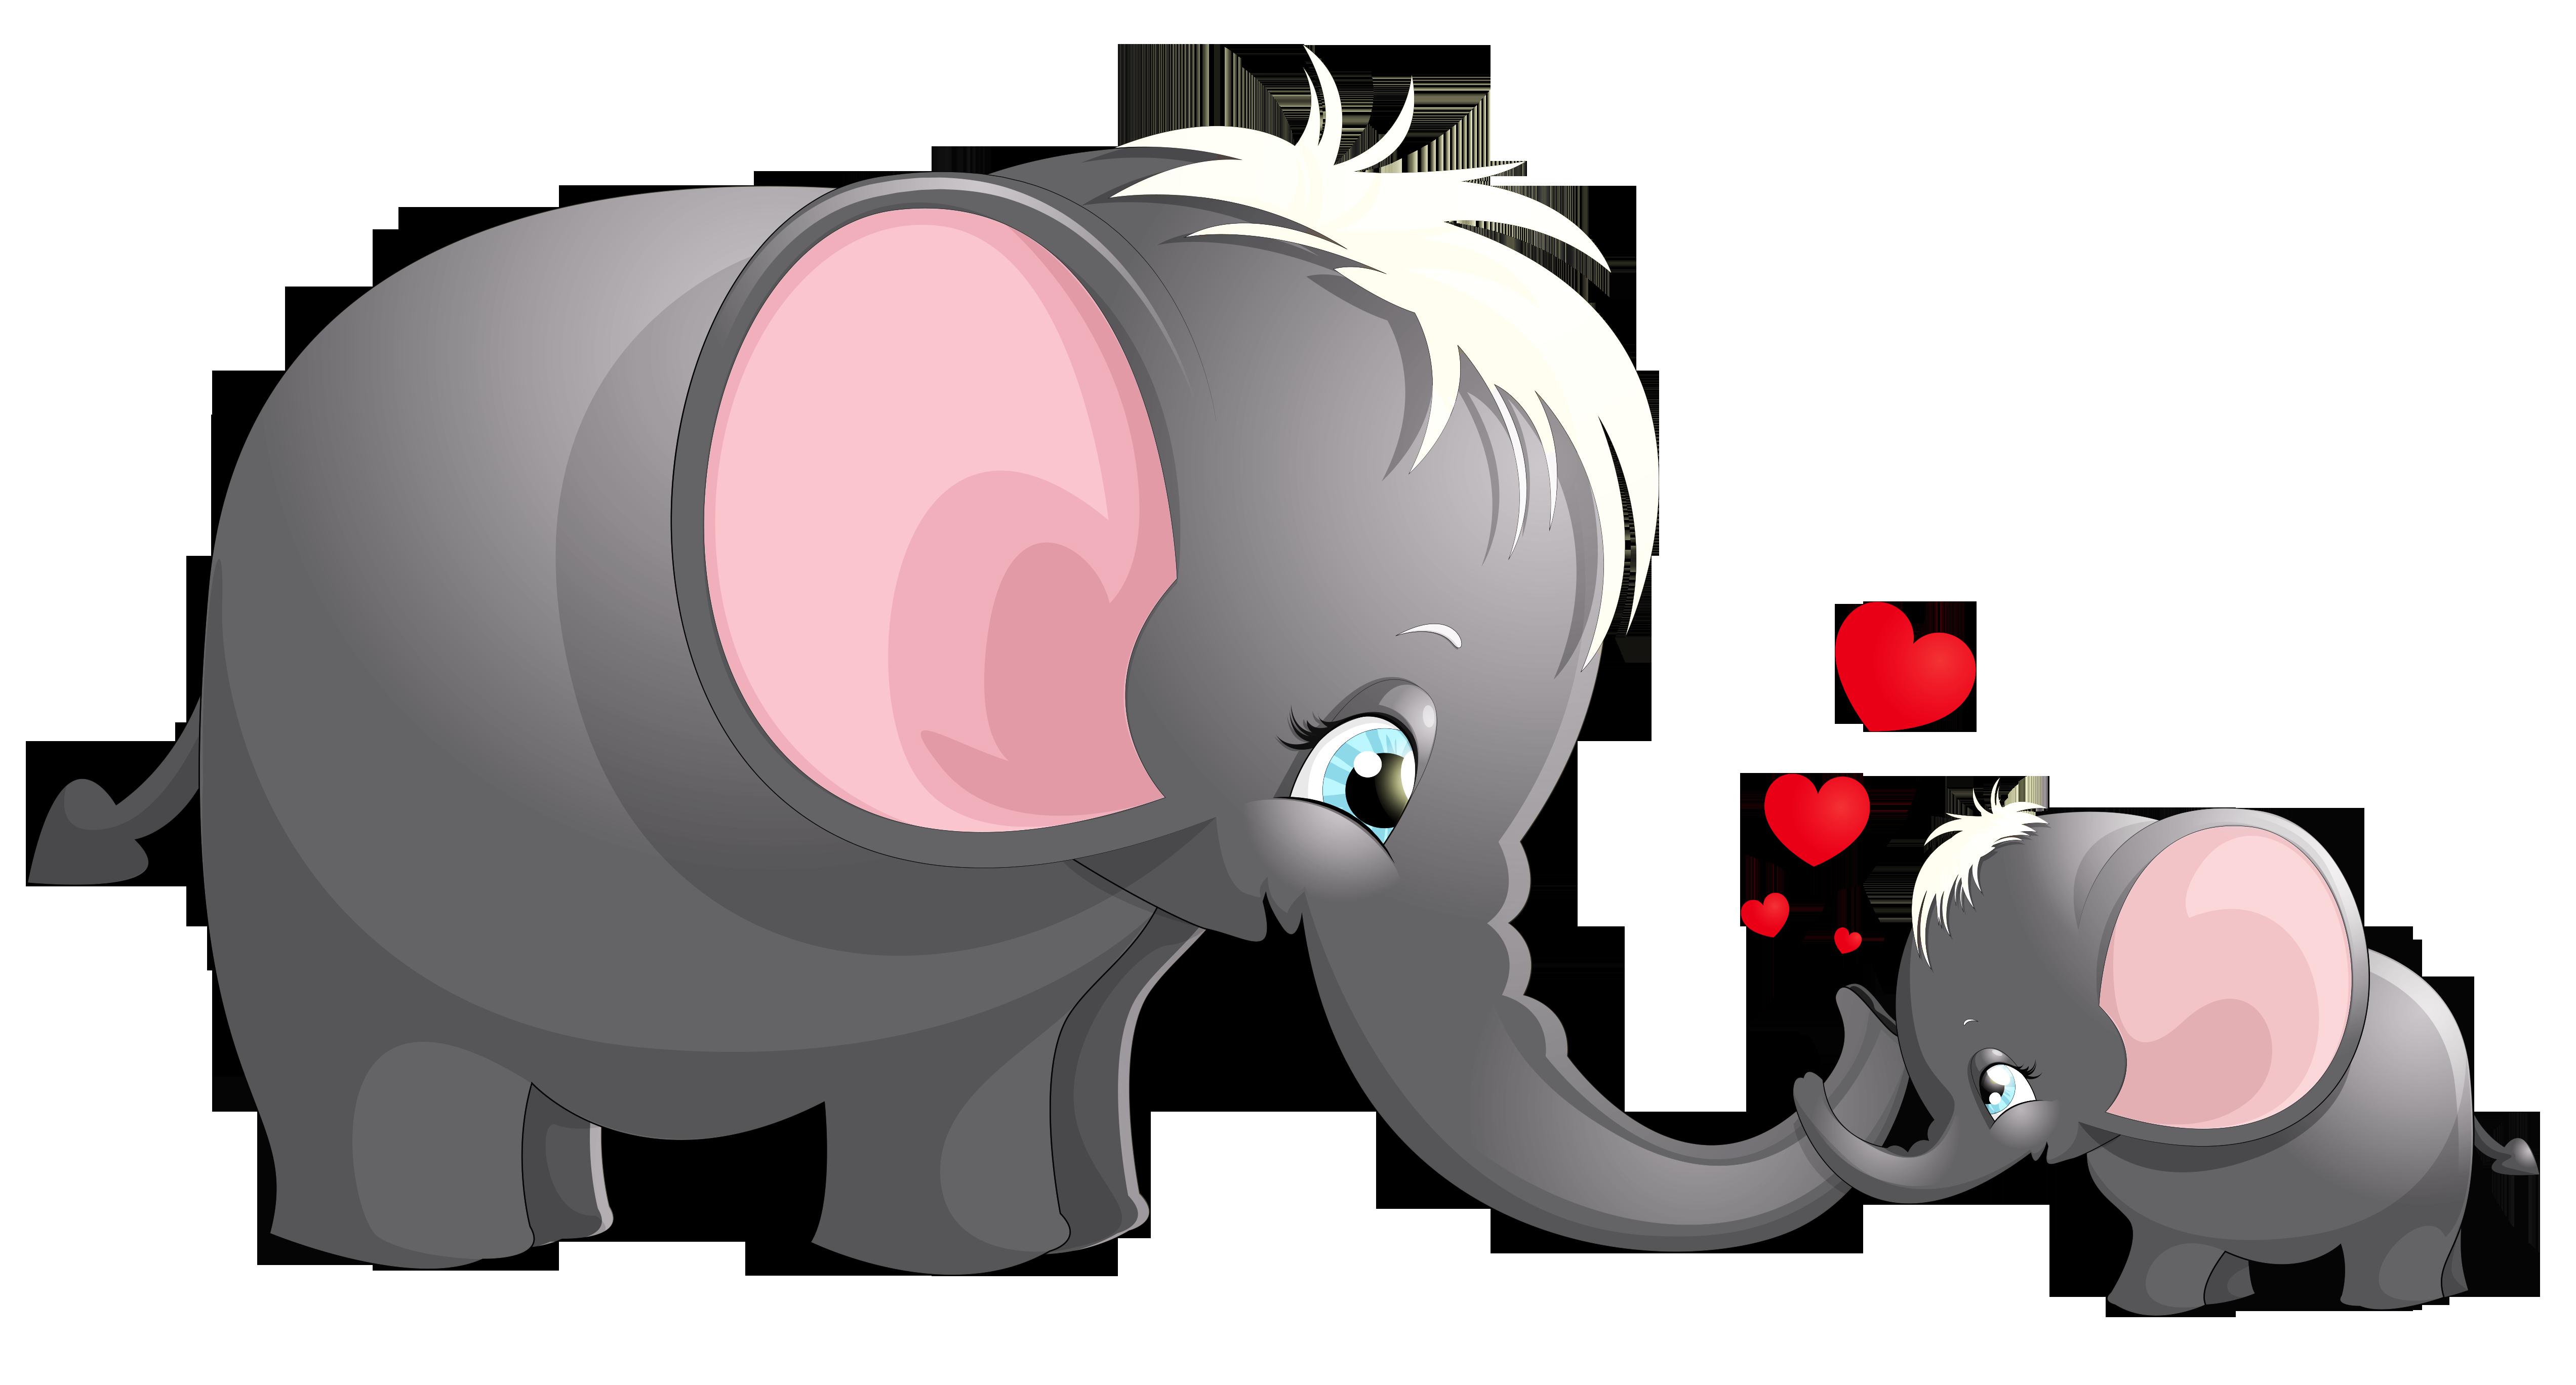 Mama elephant clipart png transparent stock elephant kid - Google Search | elephants | Pinterest png transparent stock